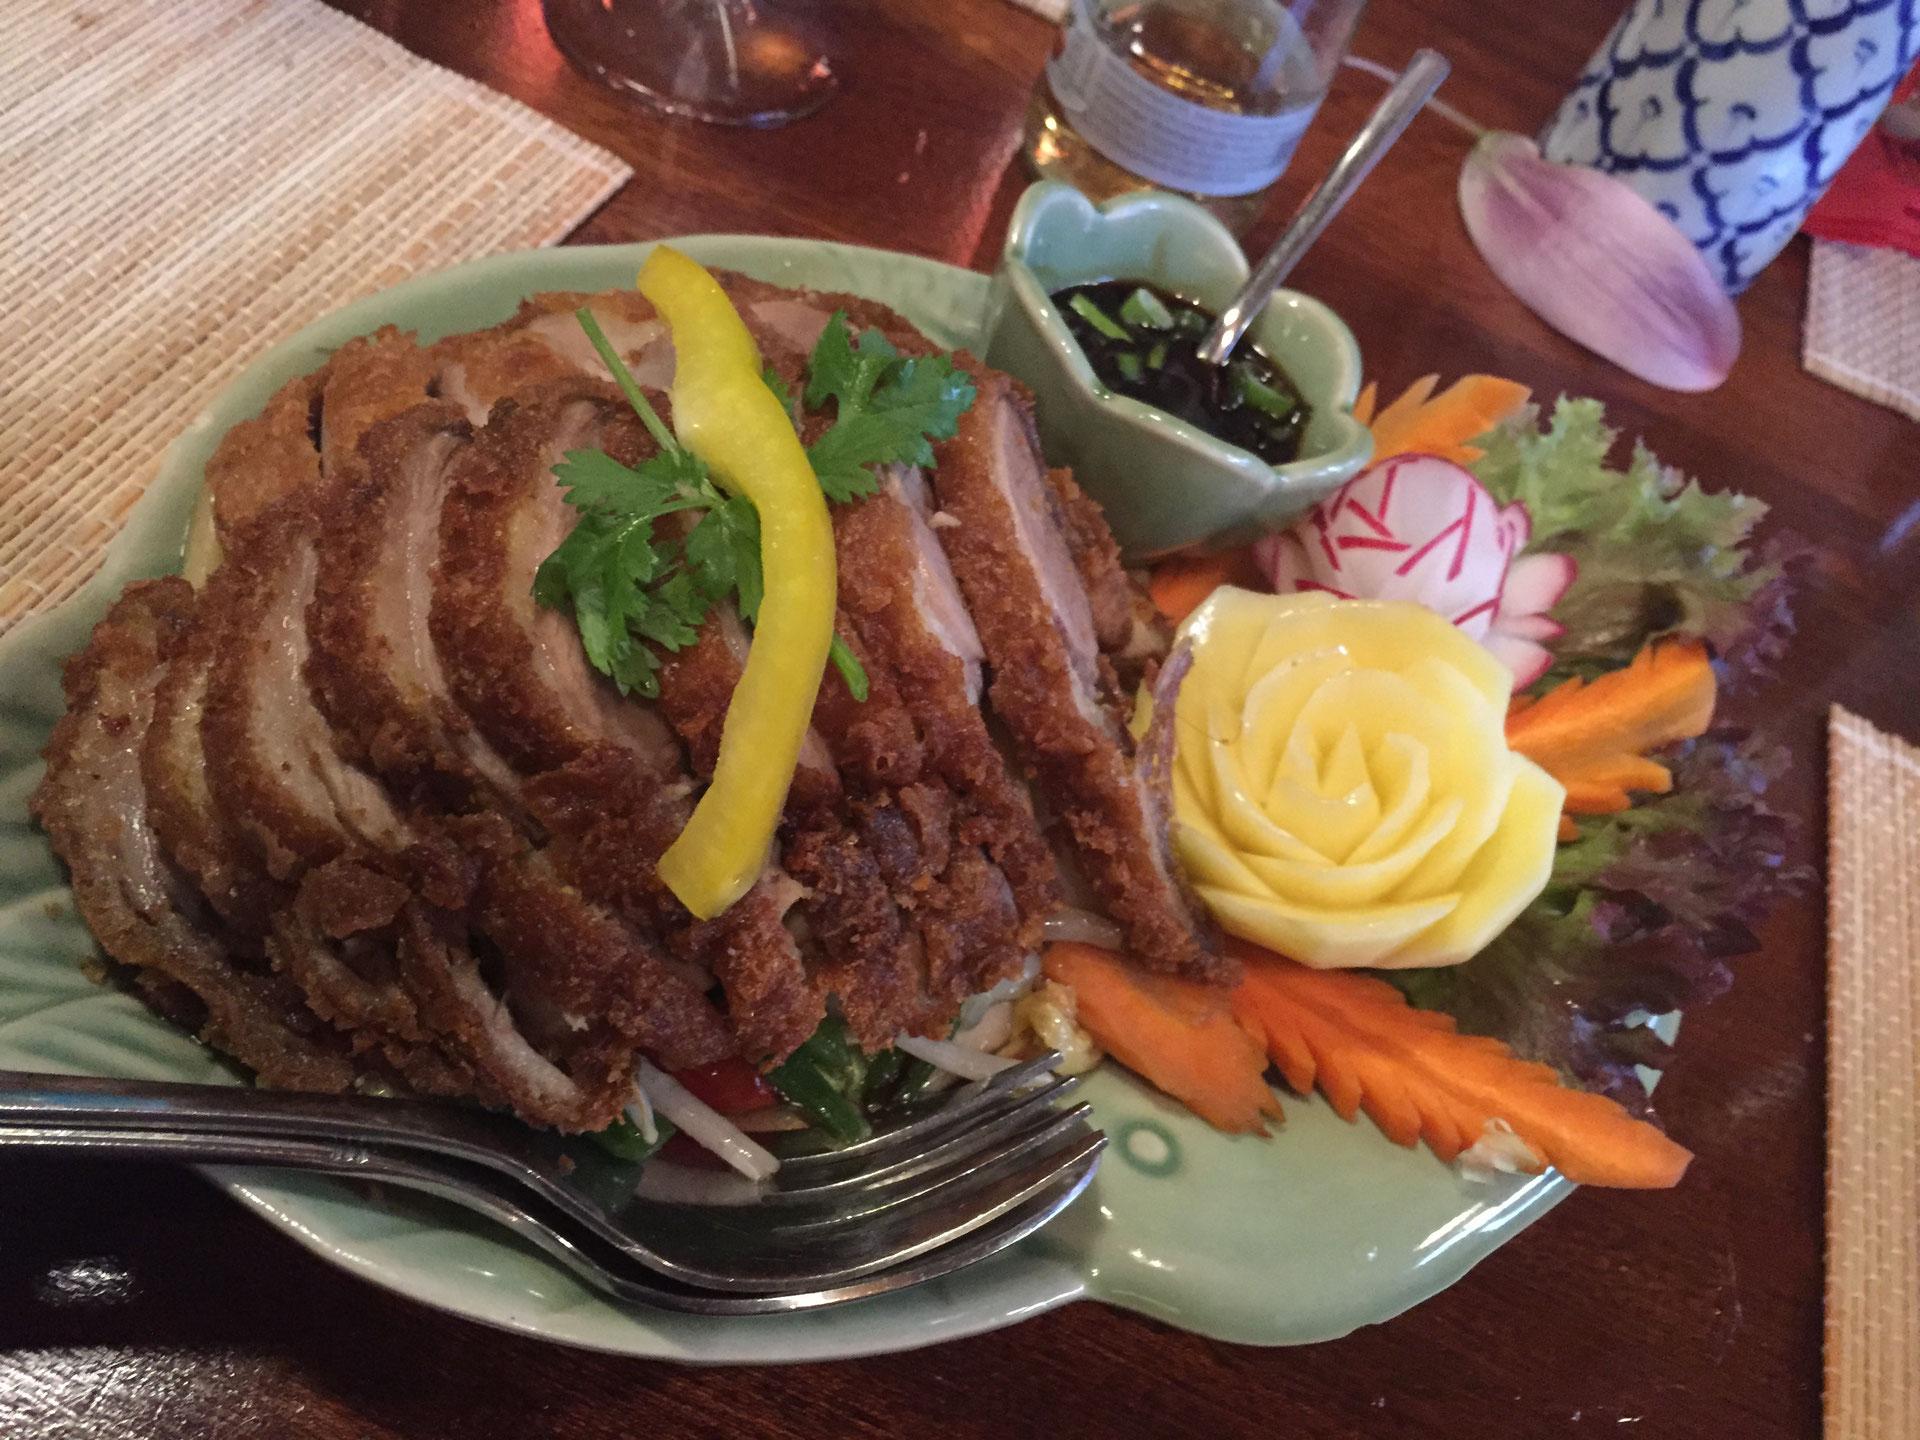 bangkok thai restaurant in koeln erfahrungsbericht low carb foodblog. Black Bedroom Furniture Sets. Home Design Ideas